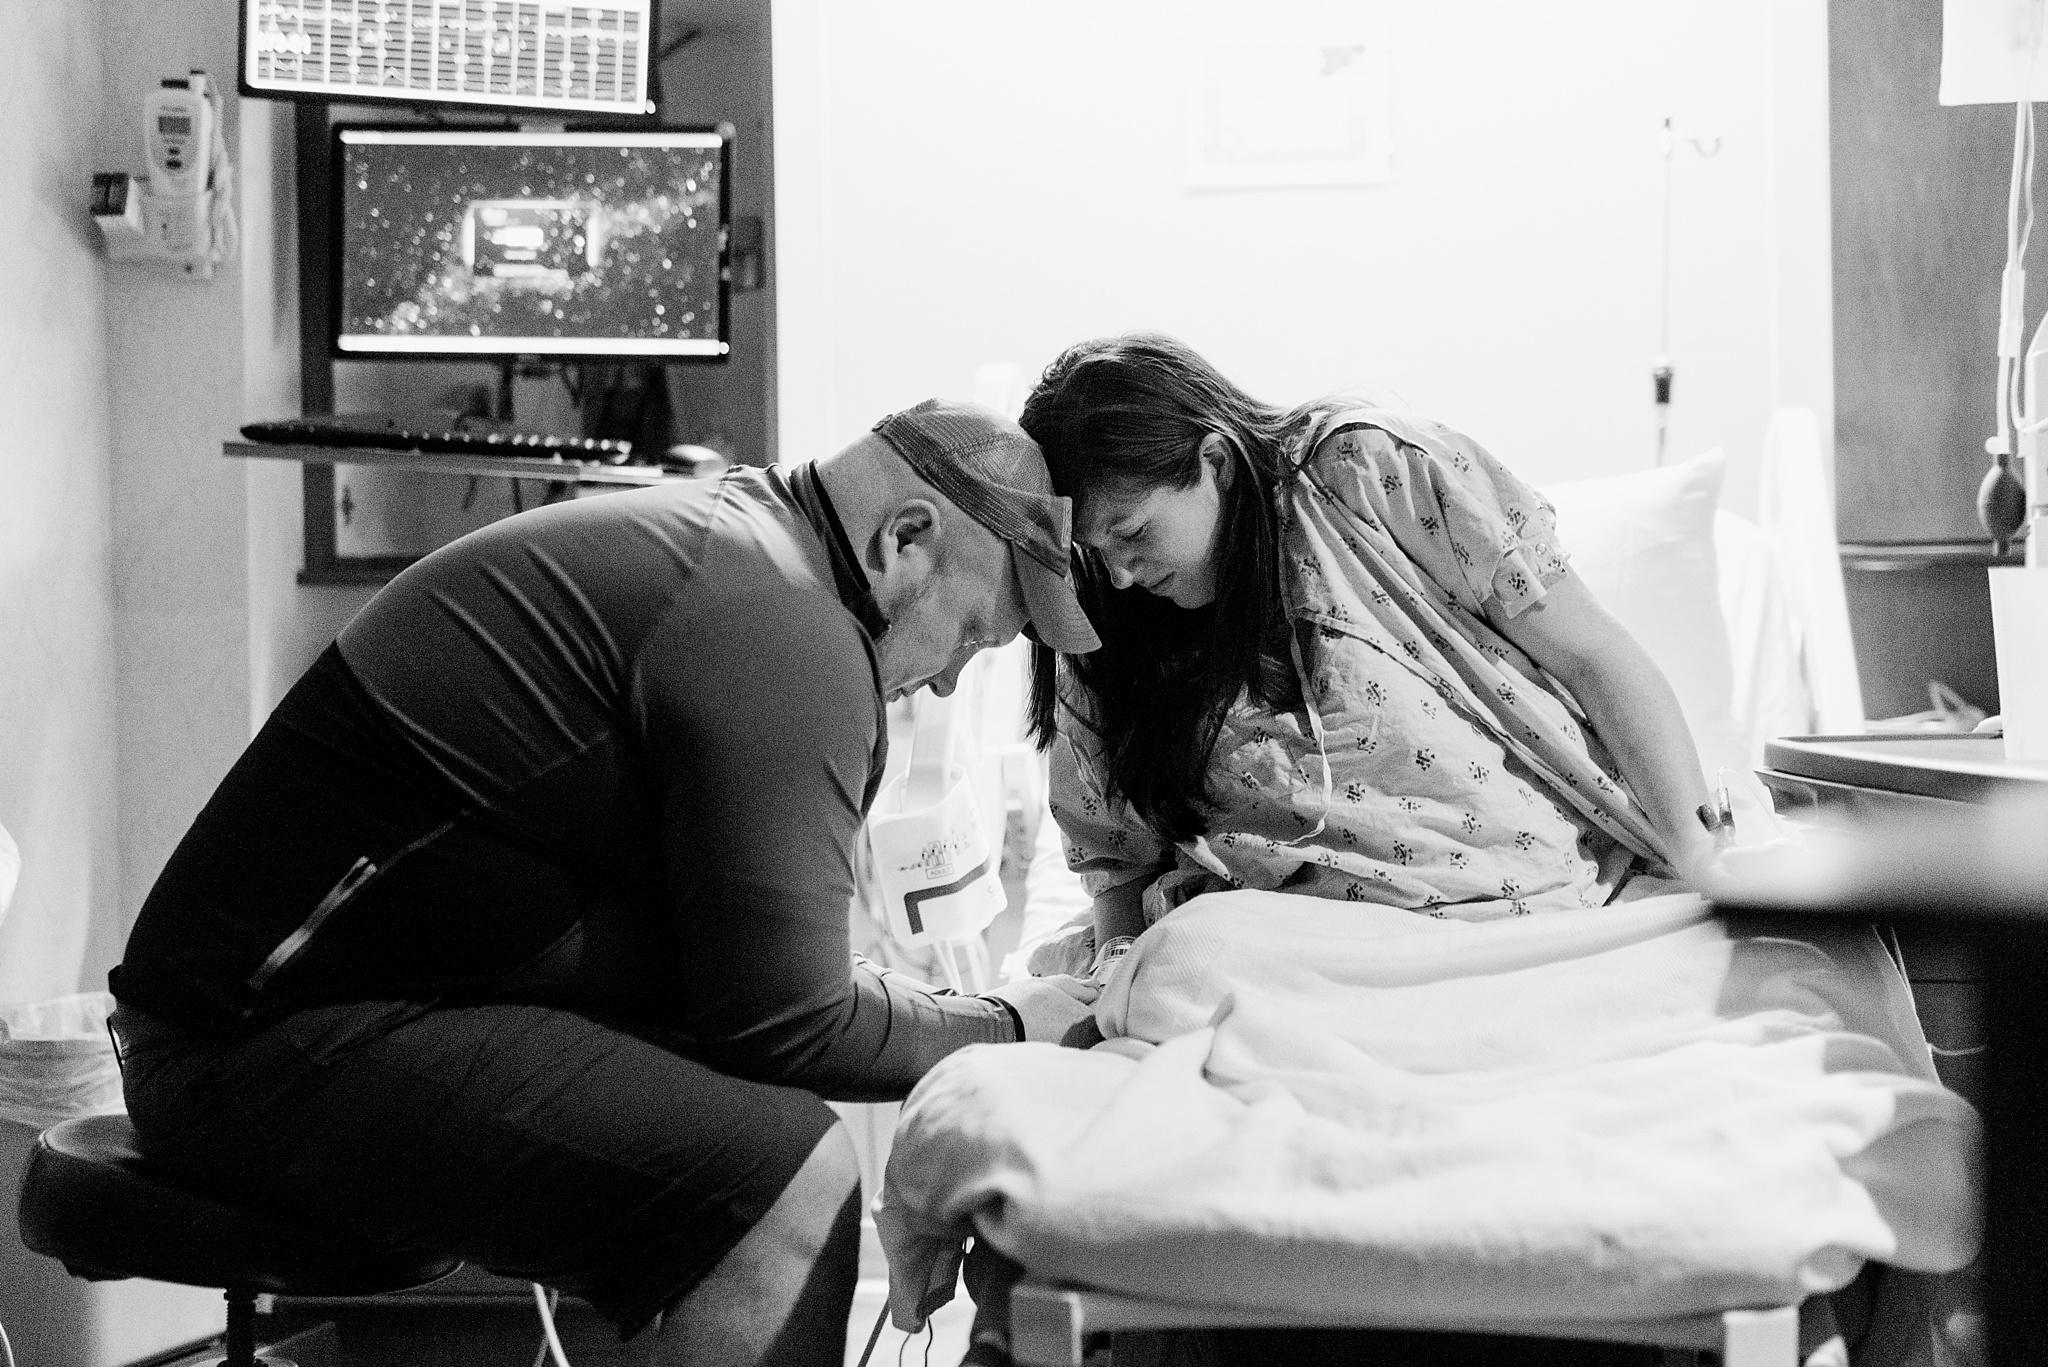 atlanta-birth-photographer-piedmont-fayette-hospital-birth-mallievinson-8.jpg